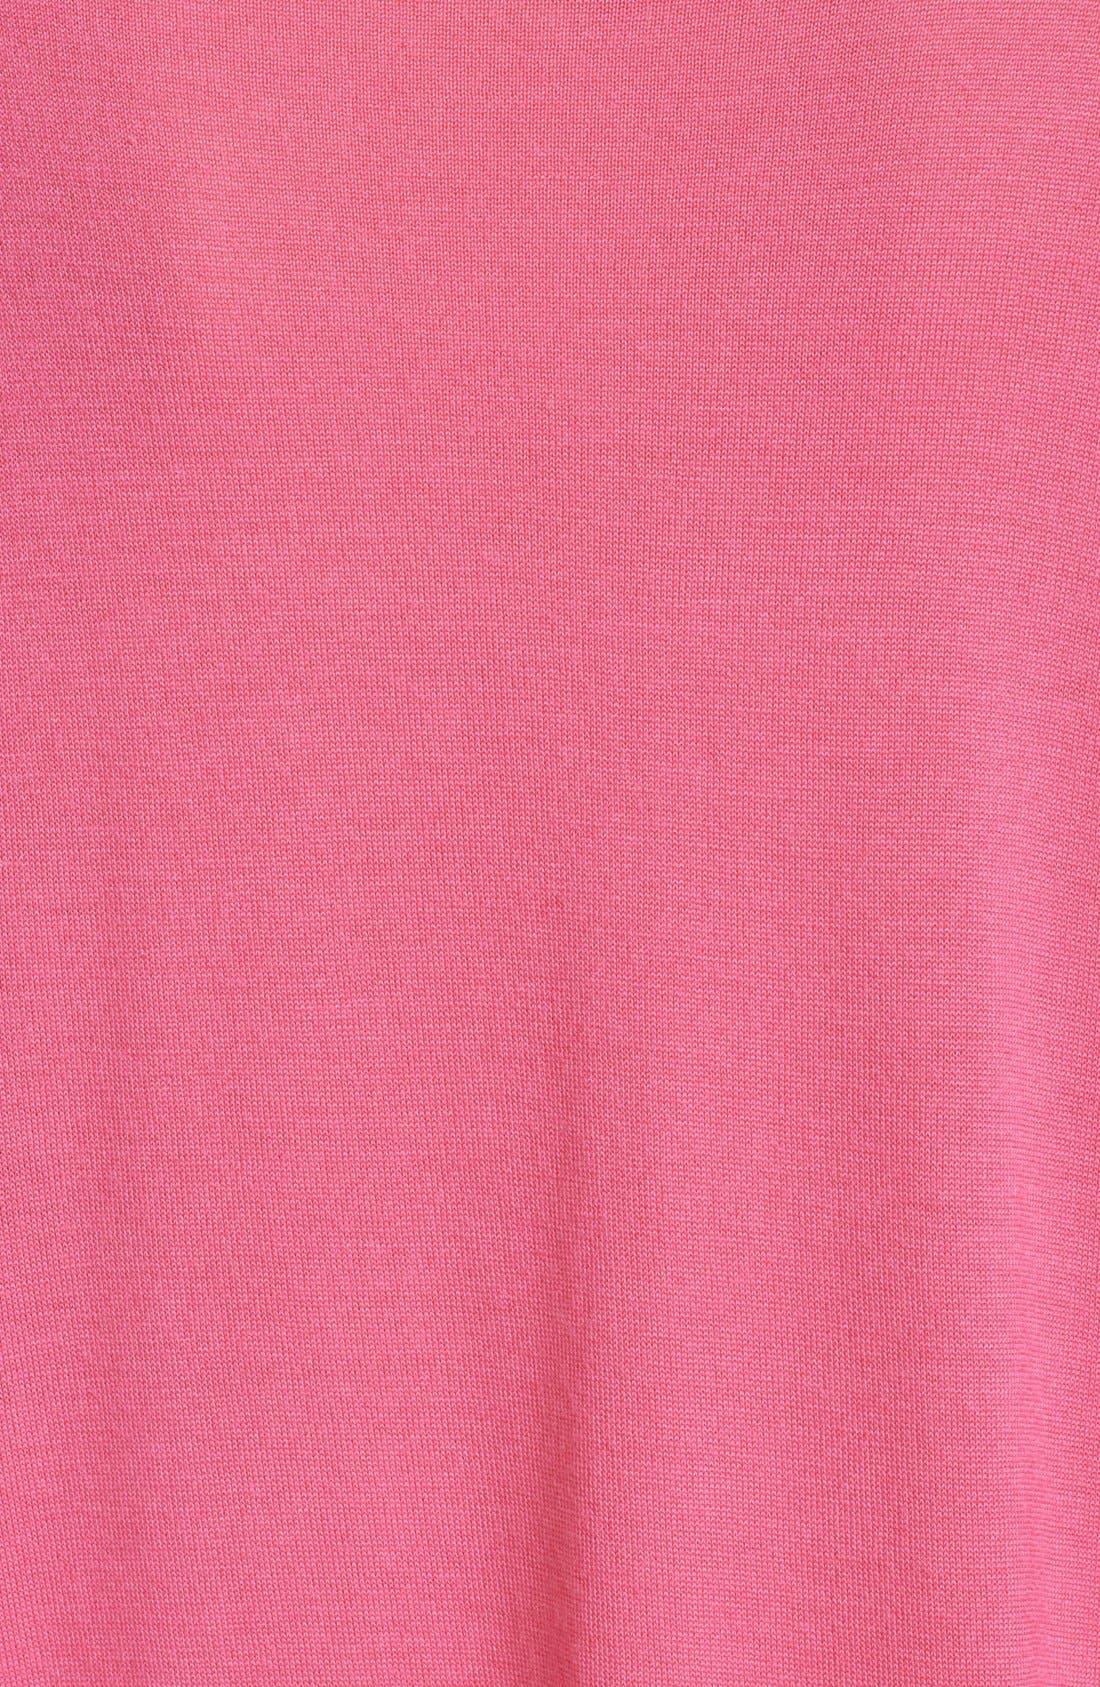 Alternate Image 3  - Michael Kors High/Low Sweater